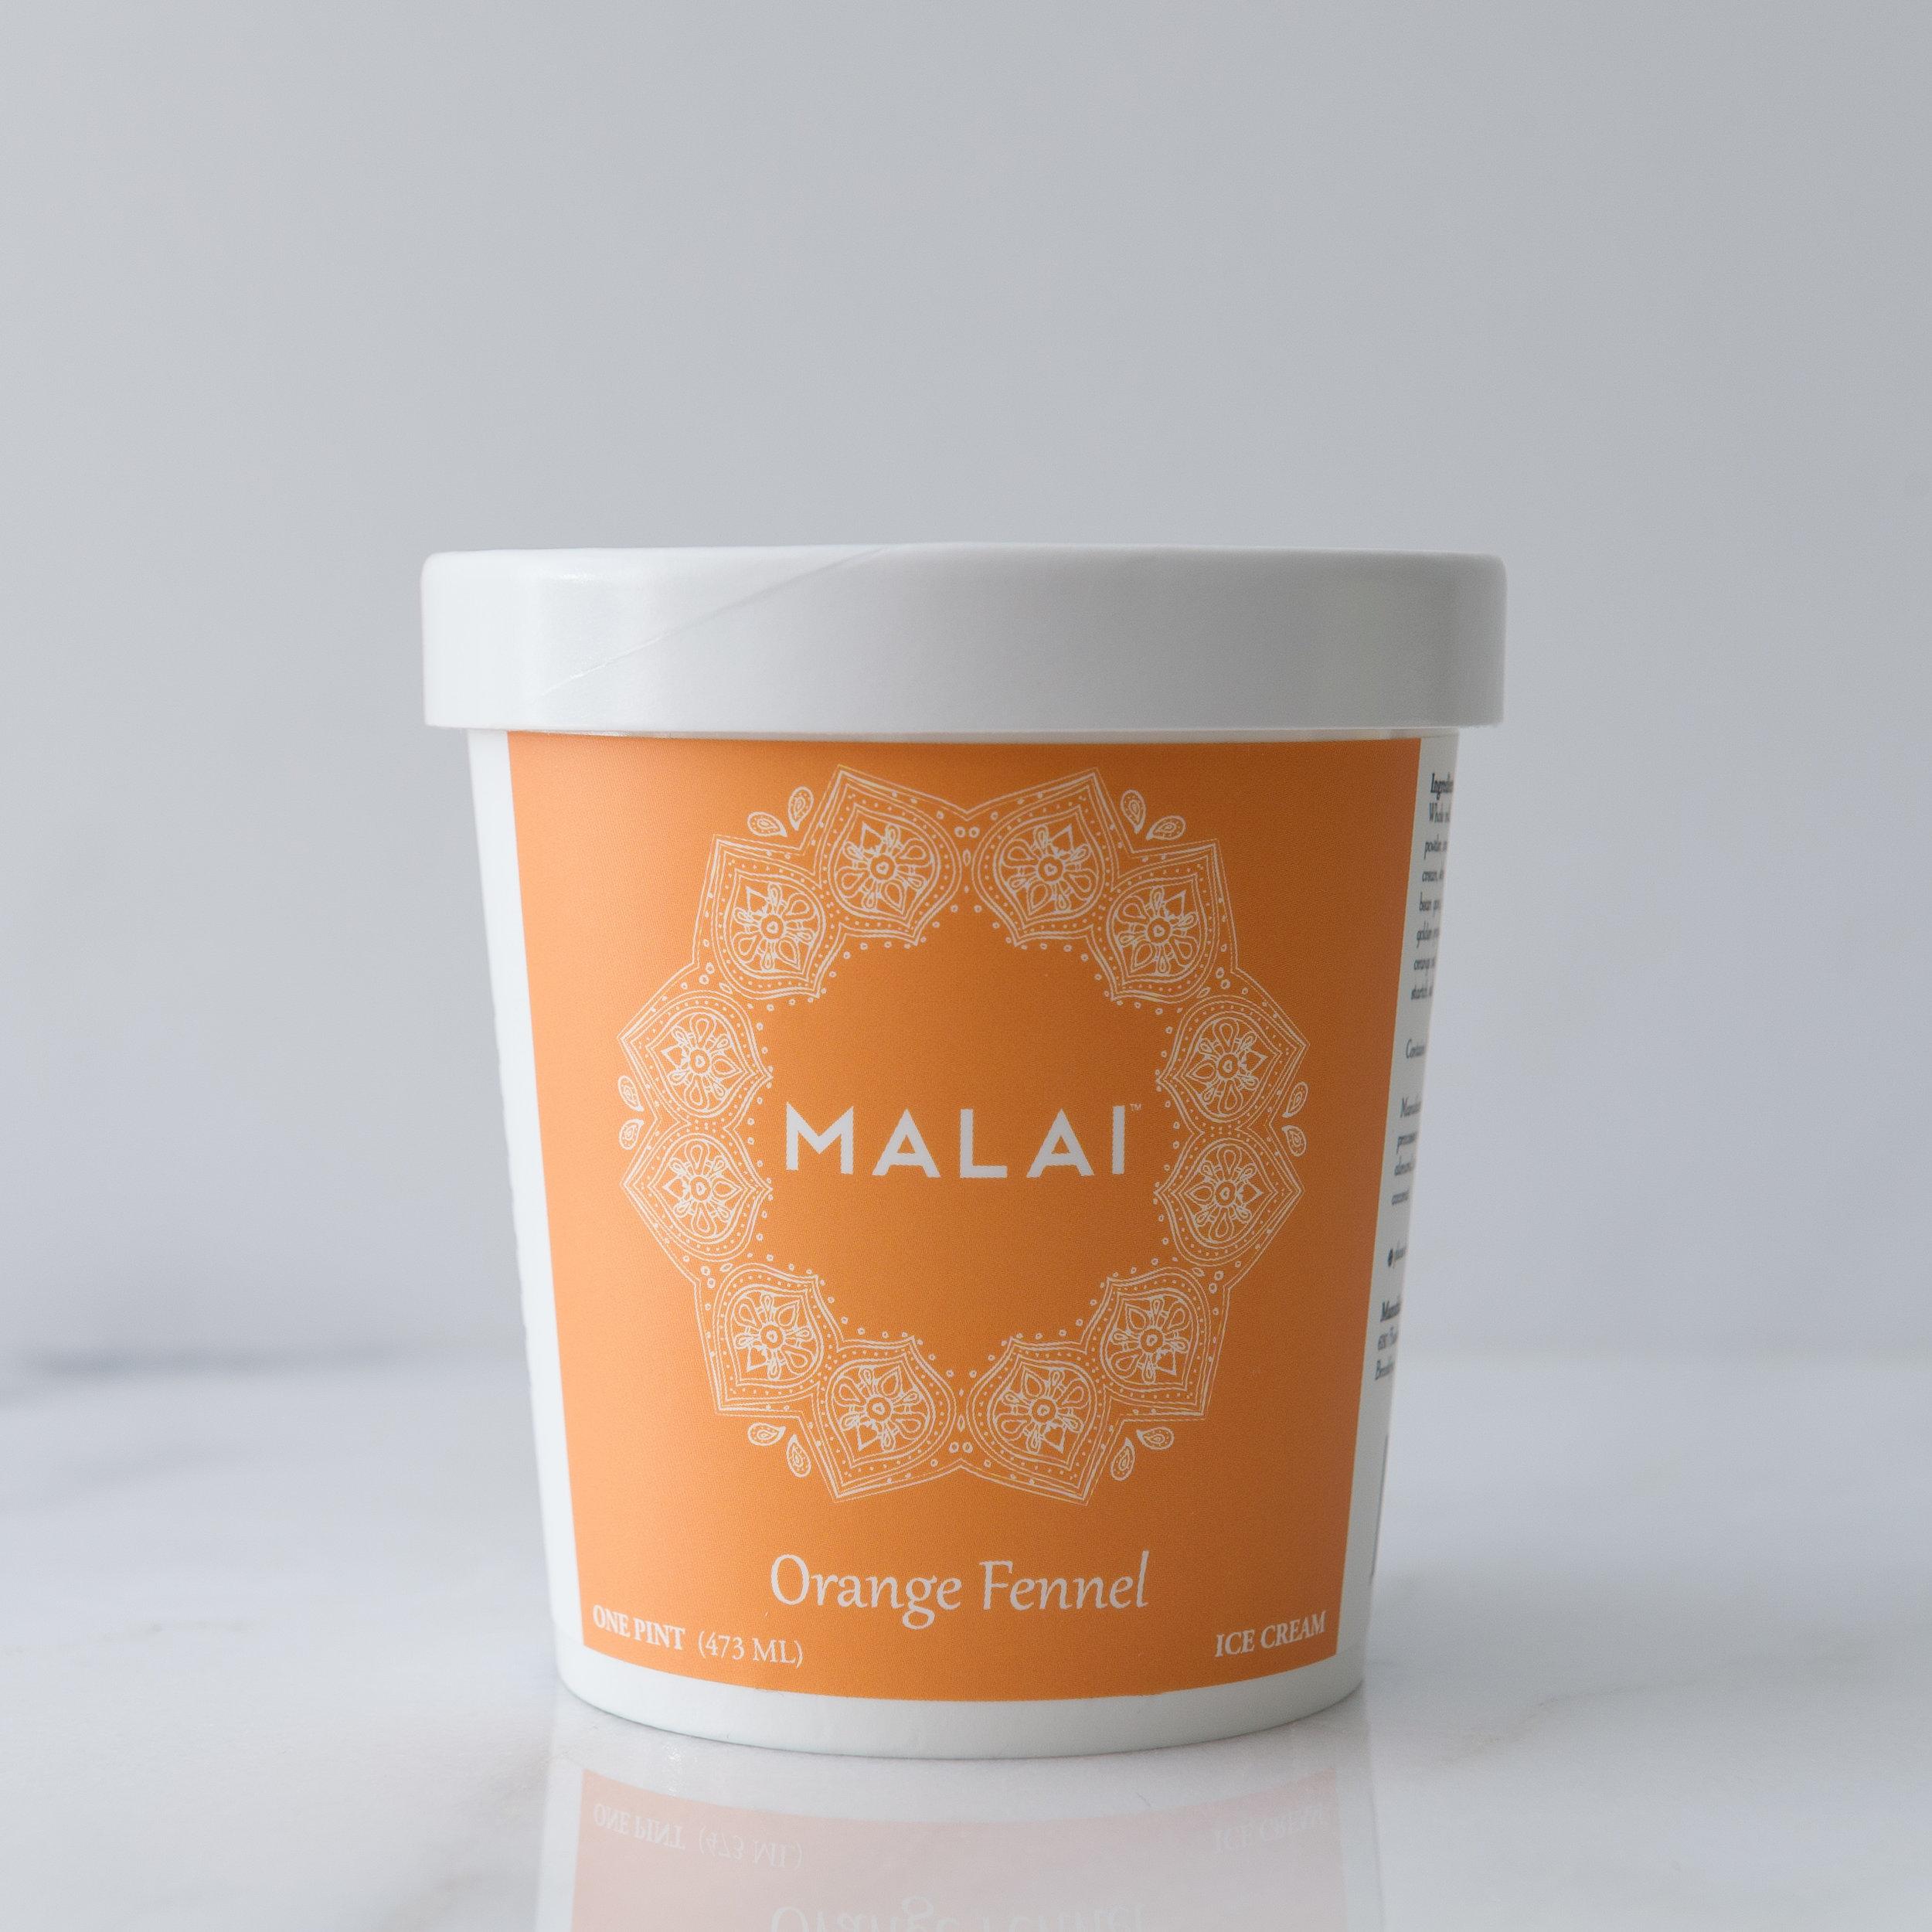 Malai_web-34.JPG